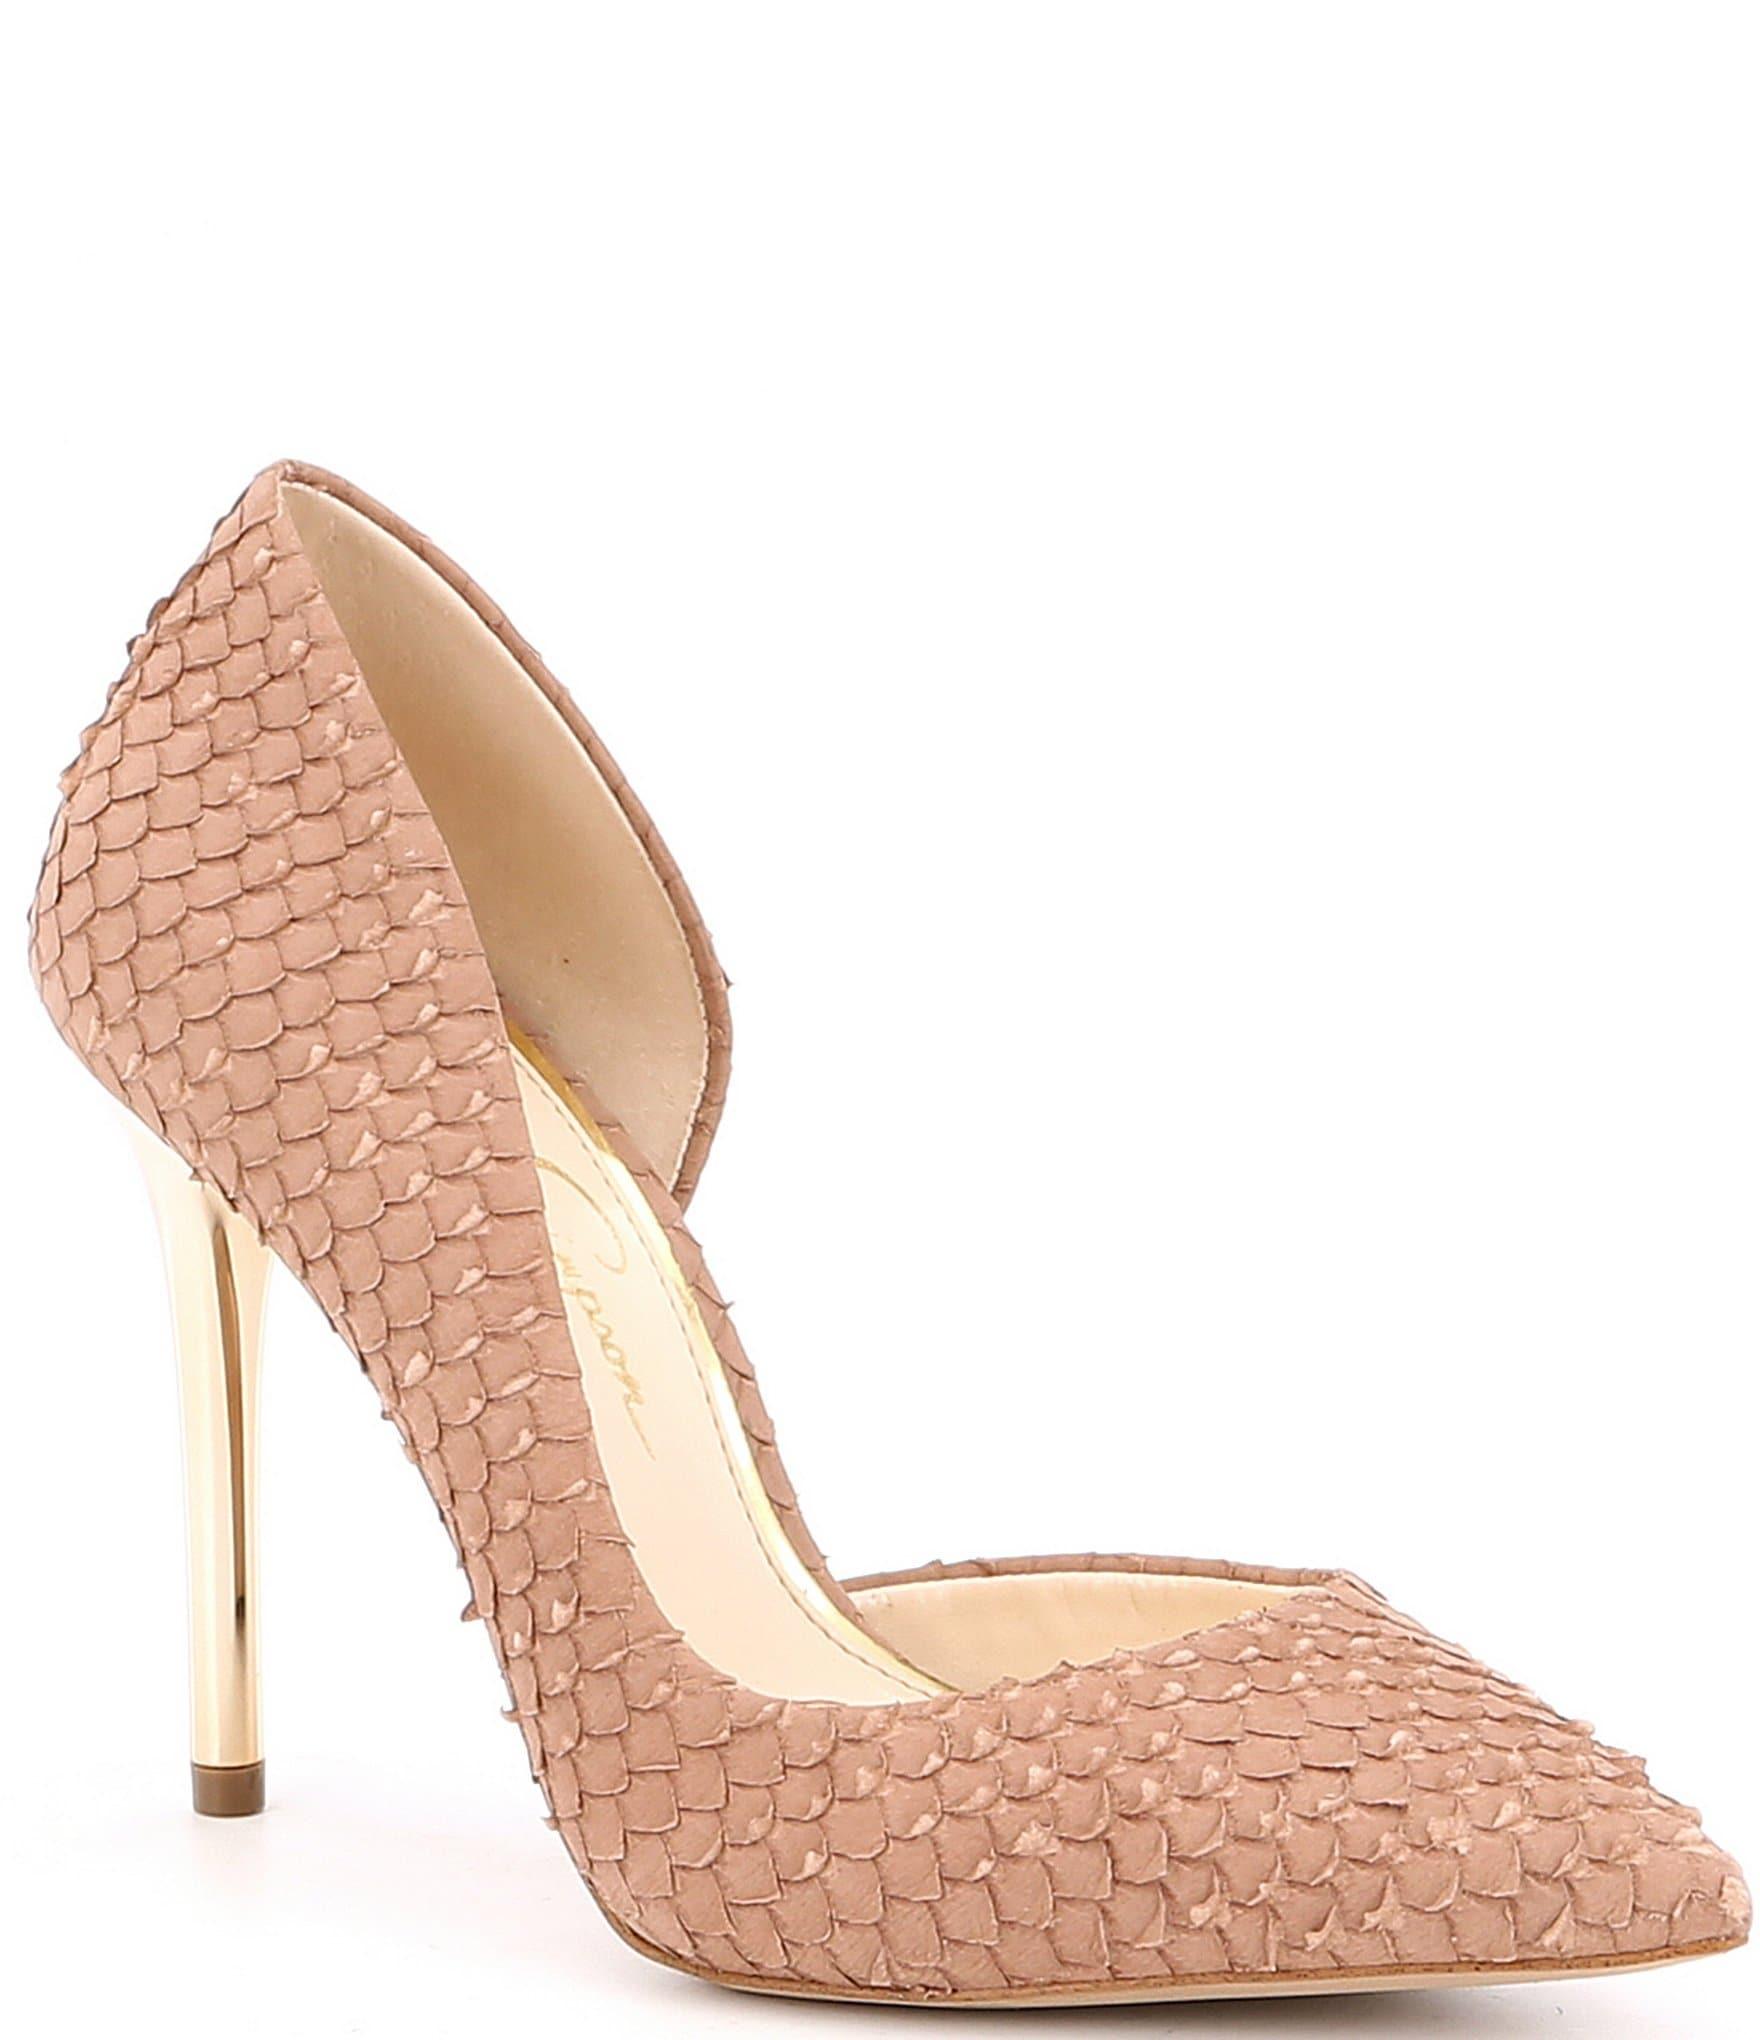 268794f5afb54 Jessica Simpson Lucina Snake Embossed Iridescent Heel Pumps